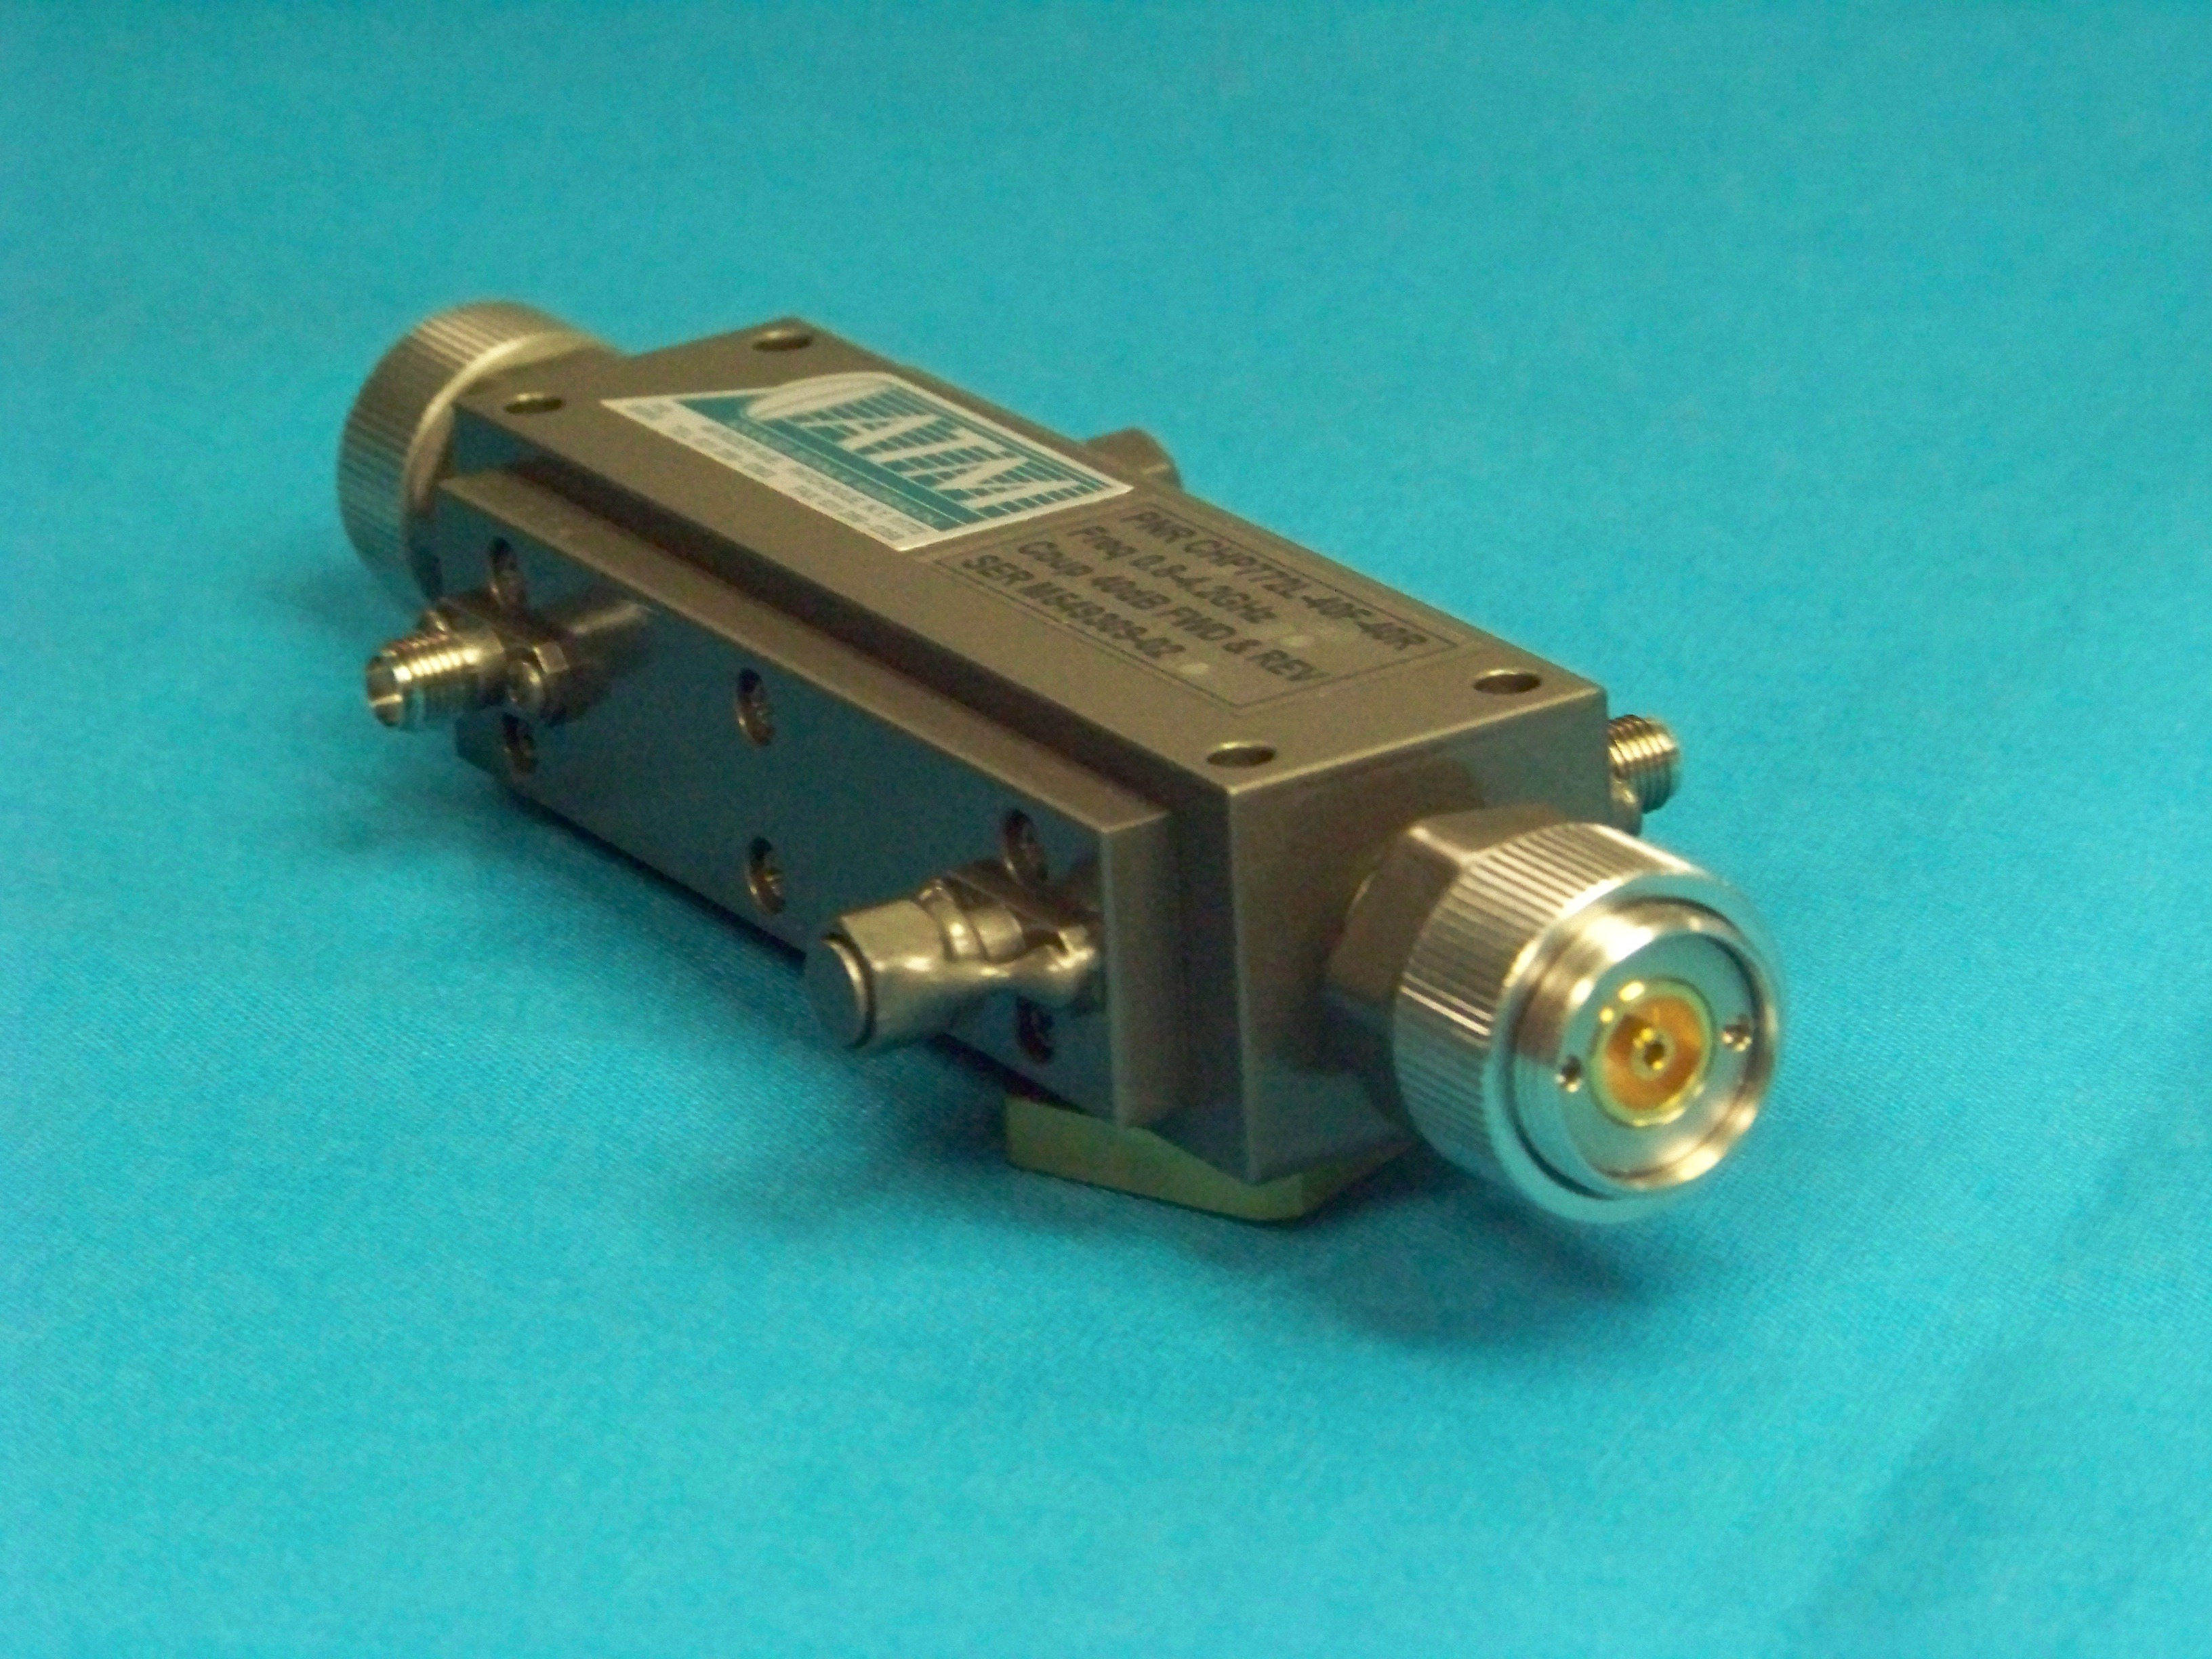 Variable Attenuator In Microwave Variable Attenuators